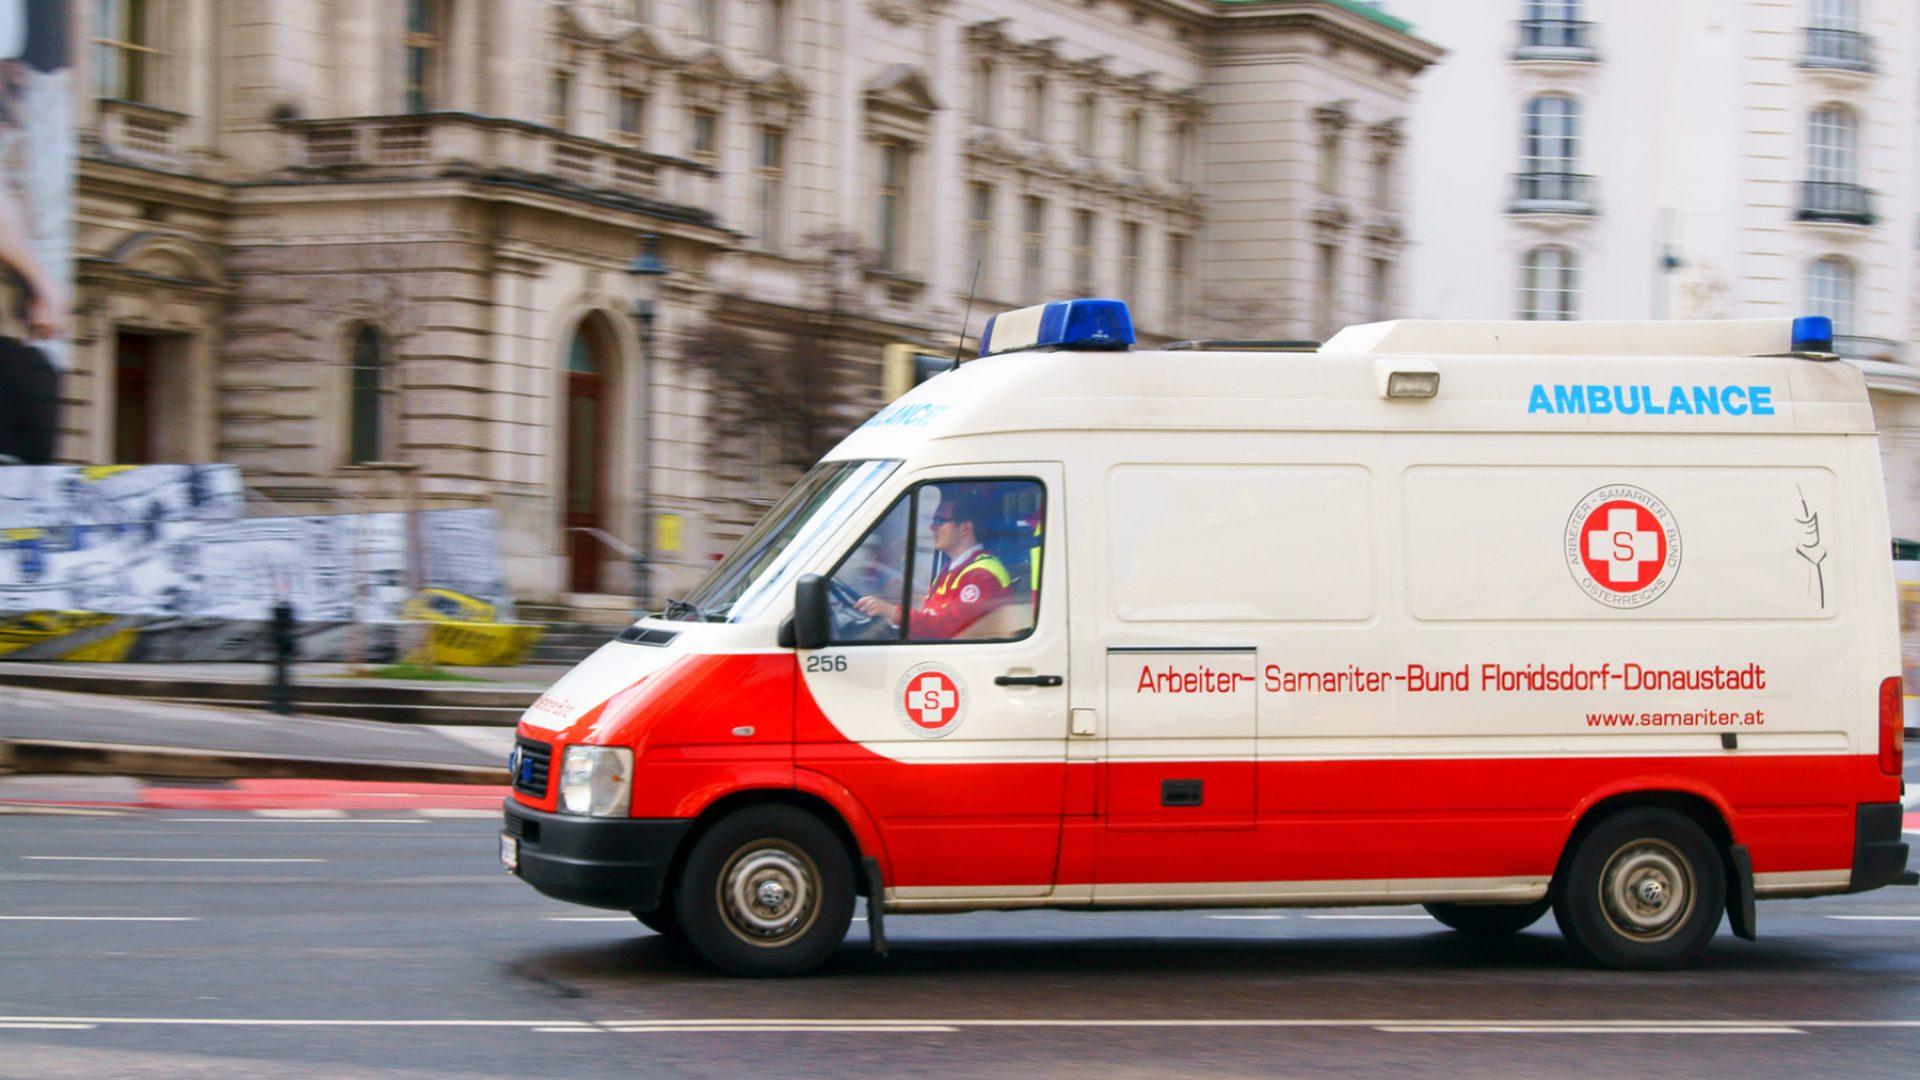 Healthcare Services in Austria